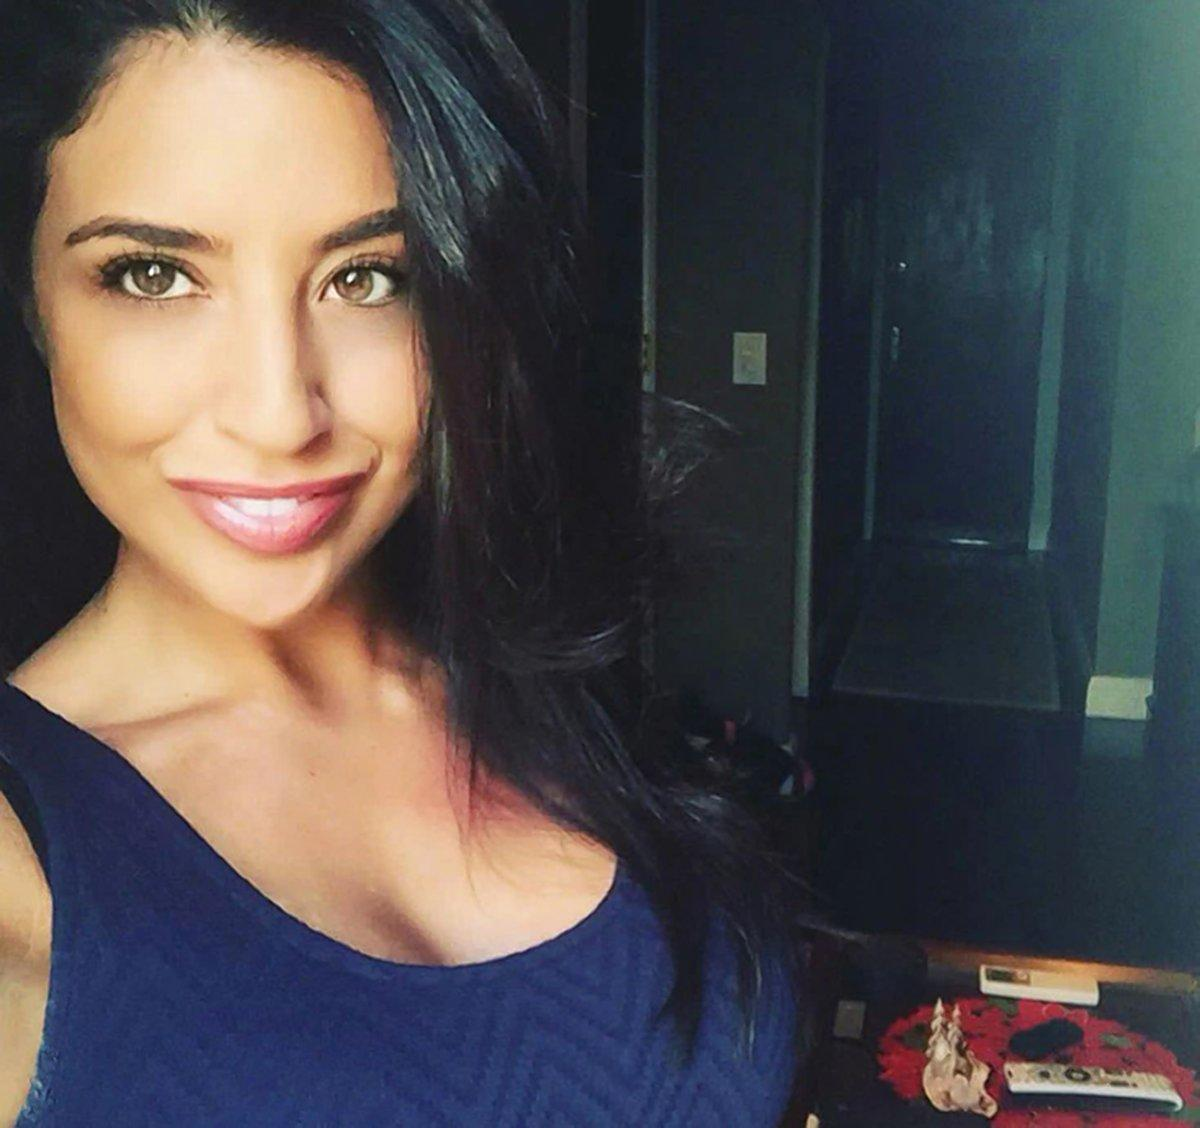 Karina Vetrano went missing while jogging.